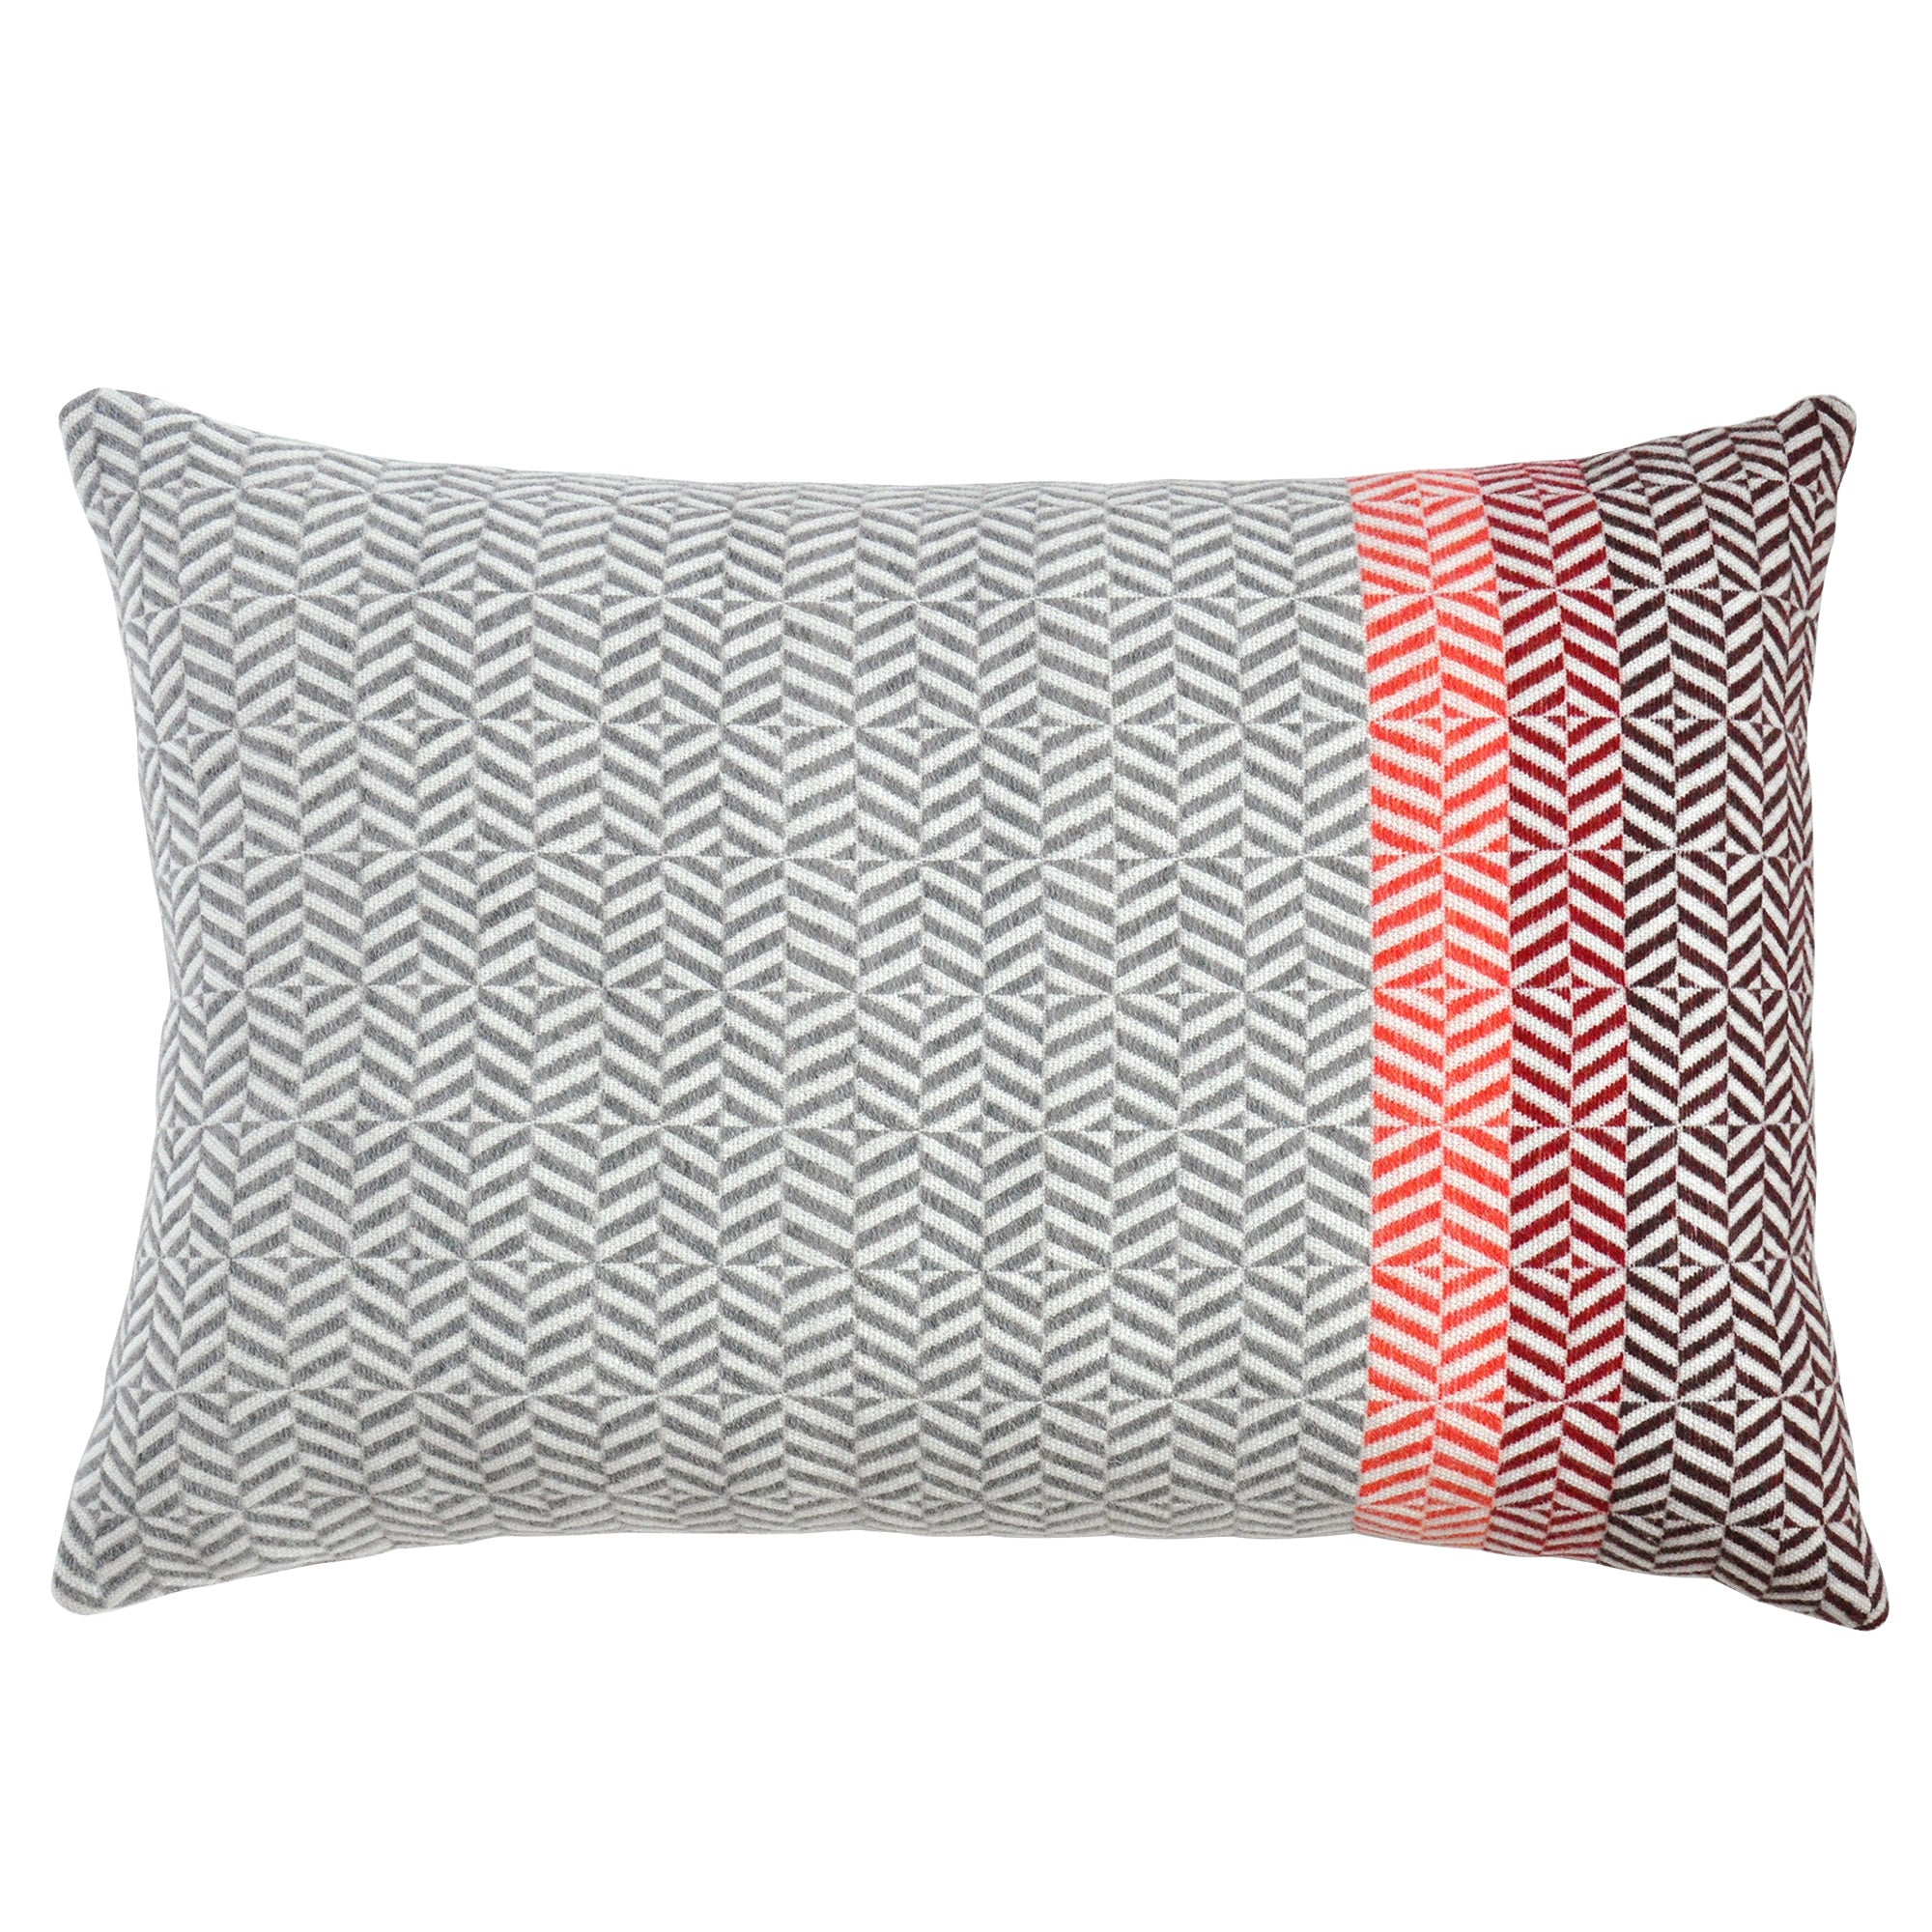 Handwoven 'Uccle' Geometric Large Merino Wool Cushion Pillow, Papaya/Grey